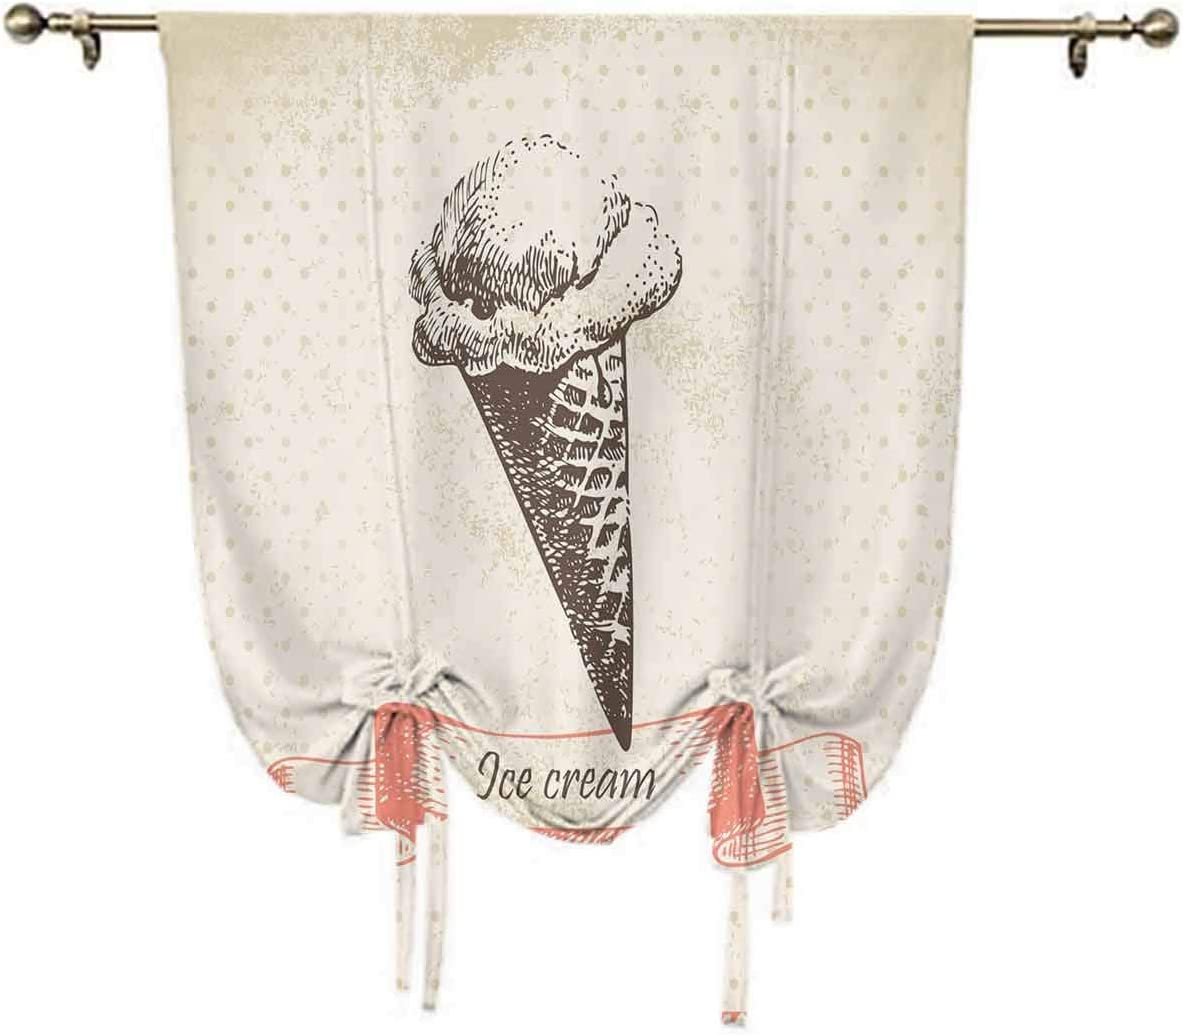 4 New sales years warranty Ice Cream Decor Small Curtain Grunge Window Nostalgic